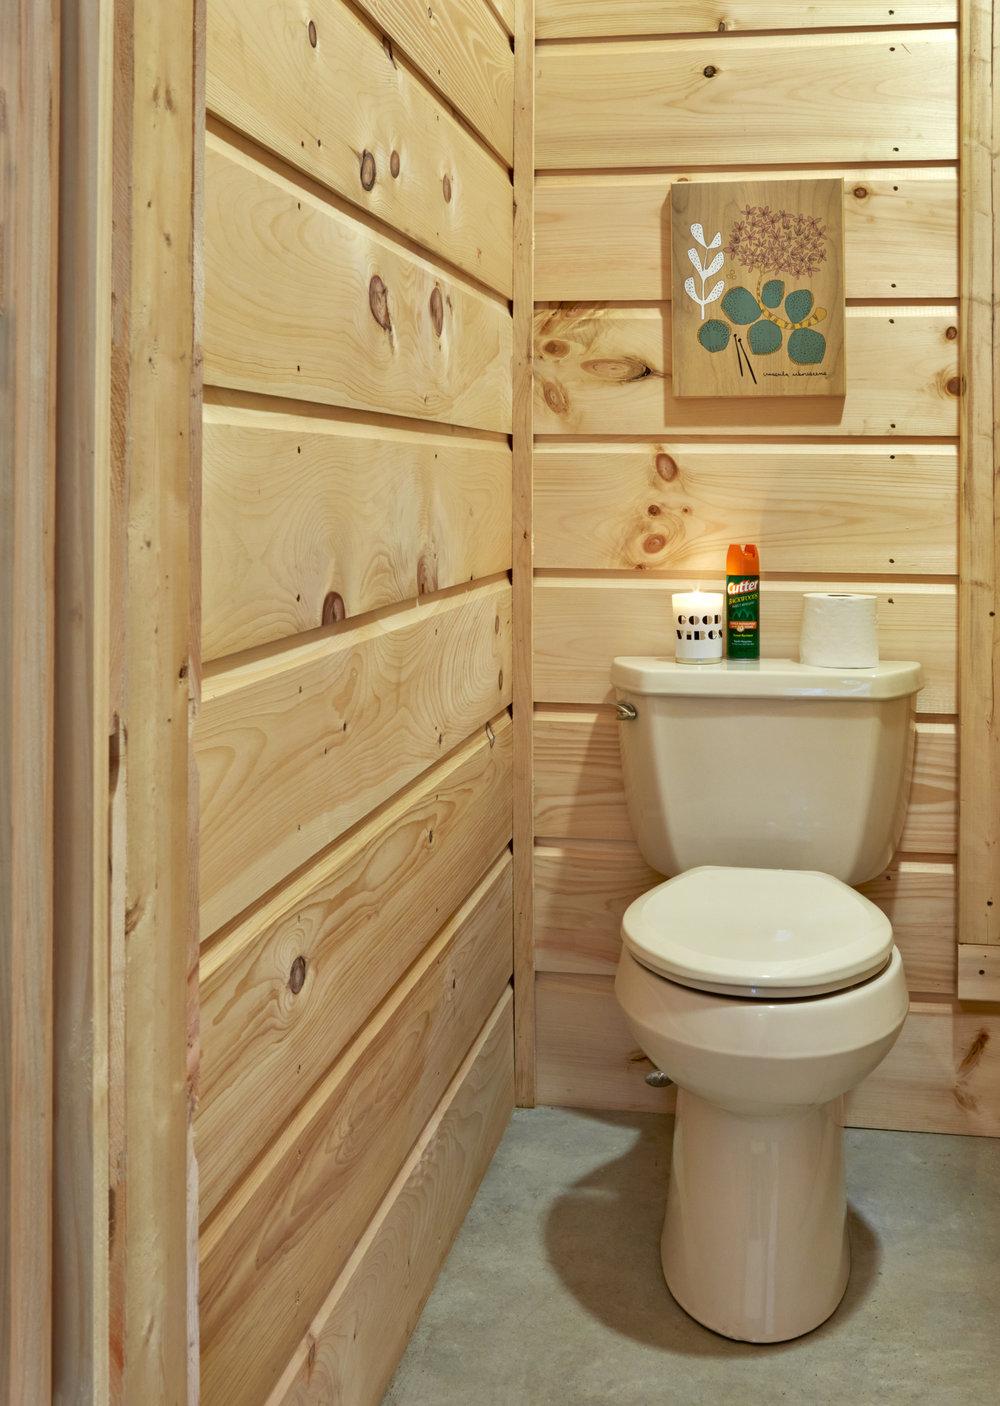 Bath House Throne